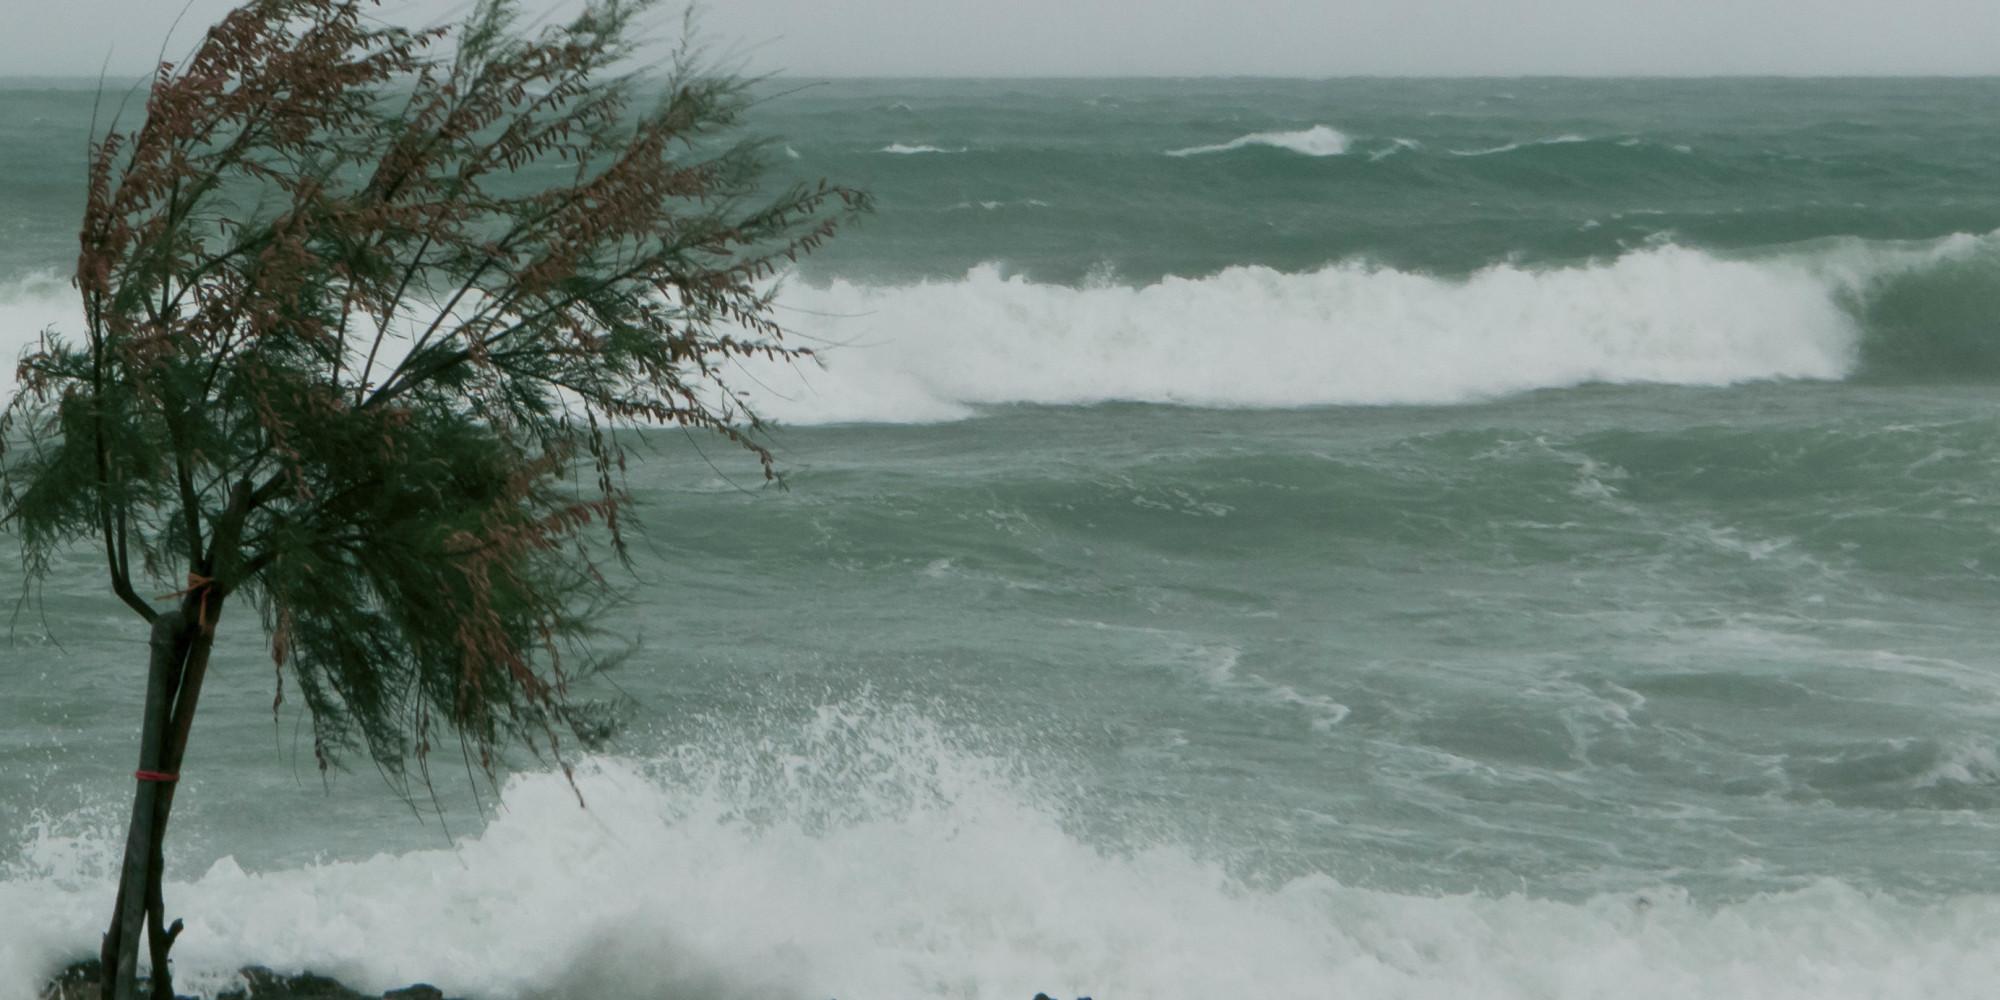 Coastal Flooding Has Surged Along Eastern Seaboard ...